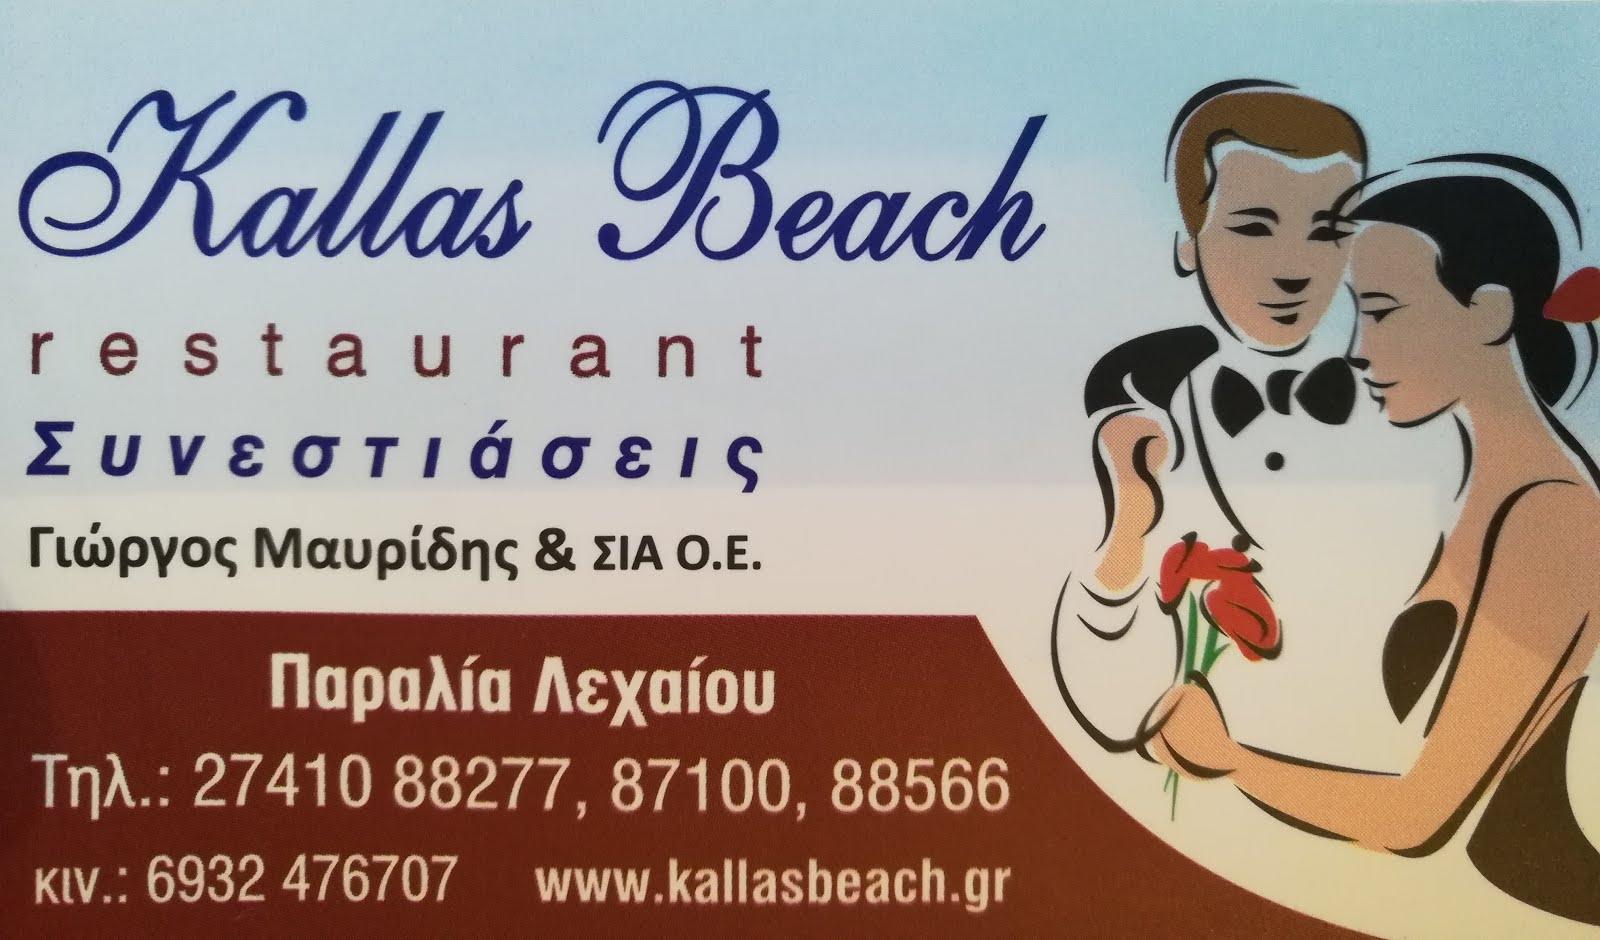 Kallas Beach